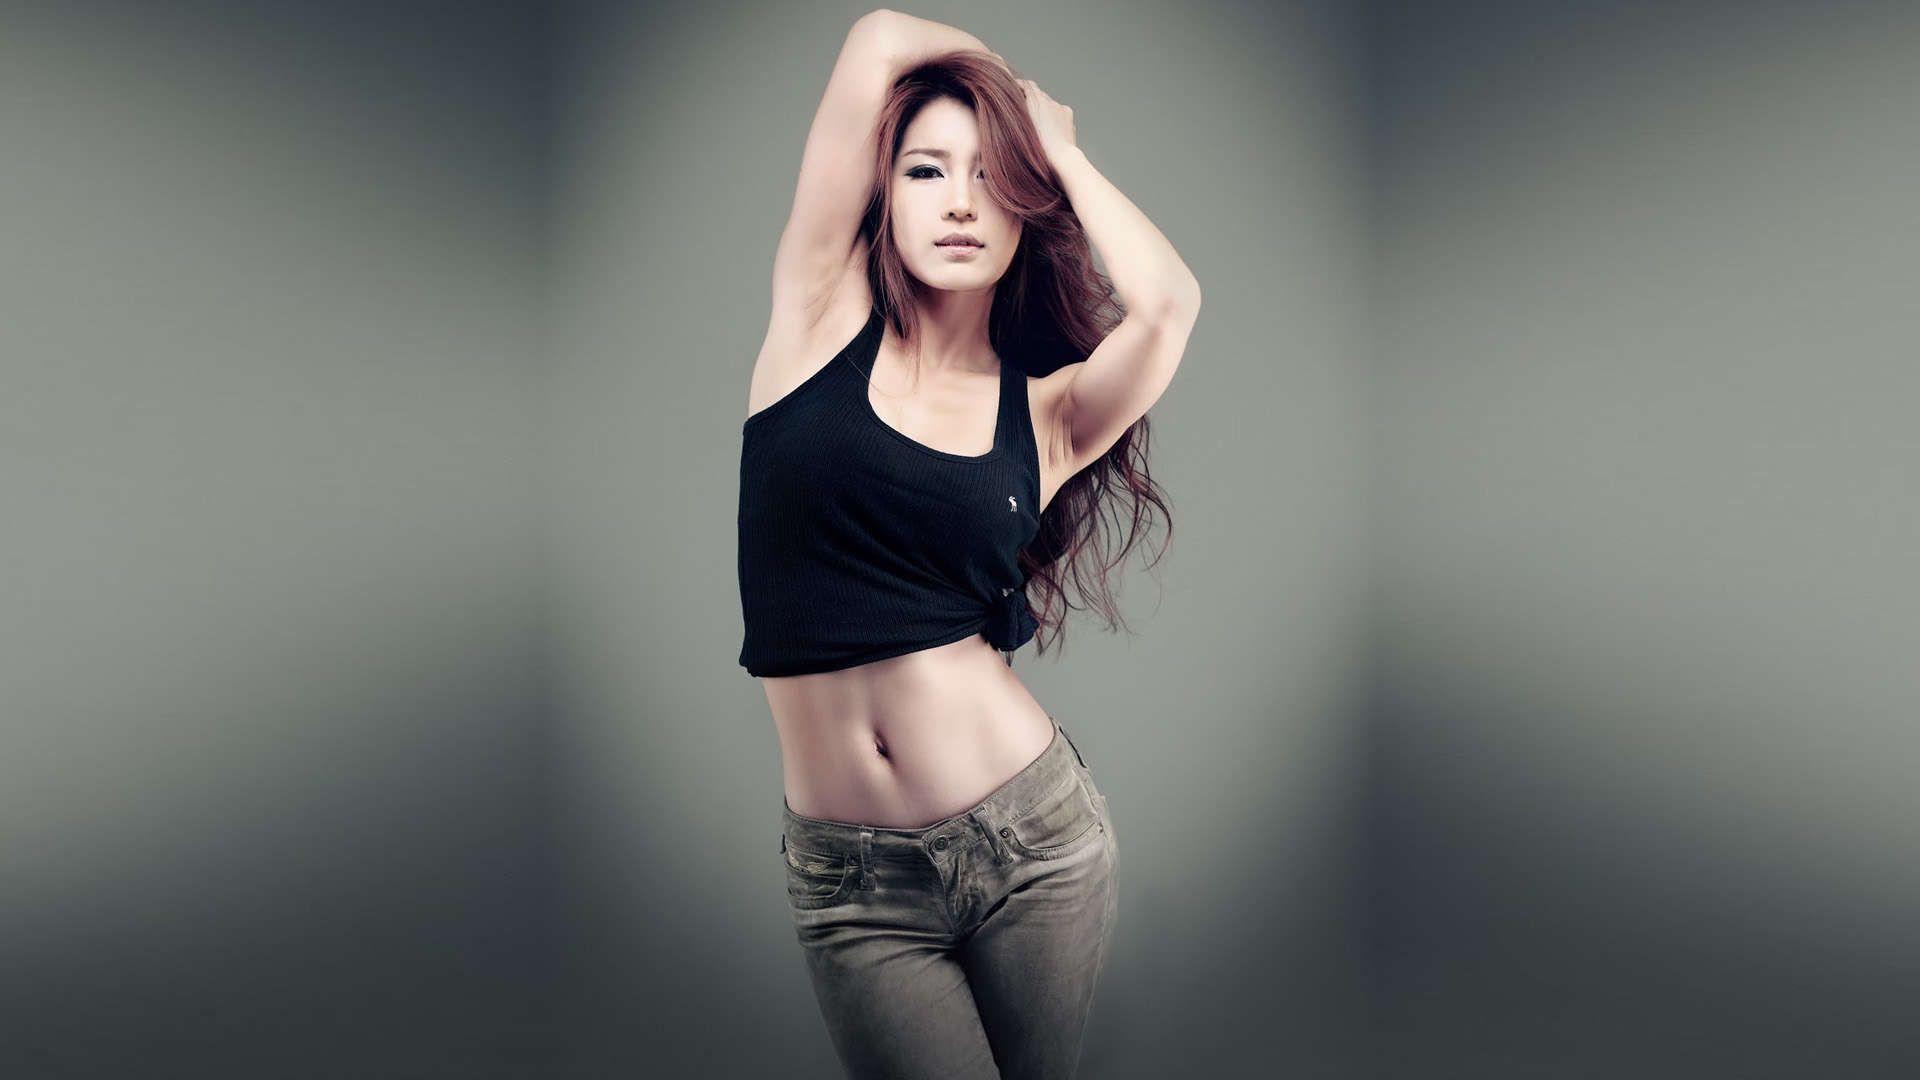 Beautiful korean girls hd wallpapers 1080p cosspay pinterest beautiful korean girls hd wallpapers 1080p voltagebd Gallery